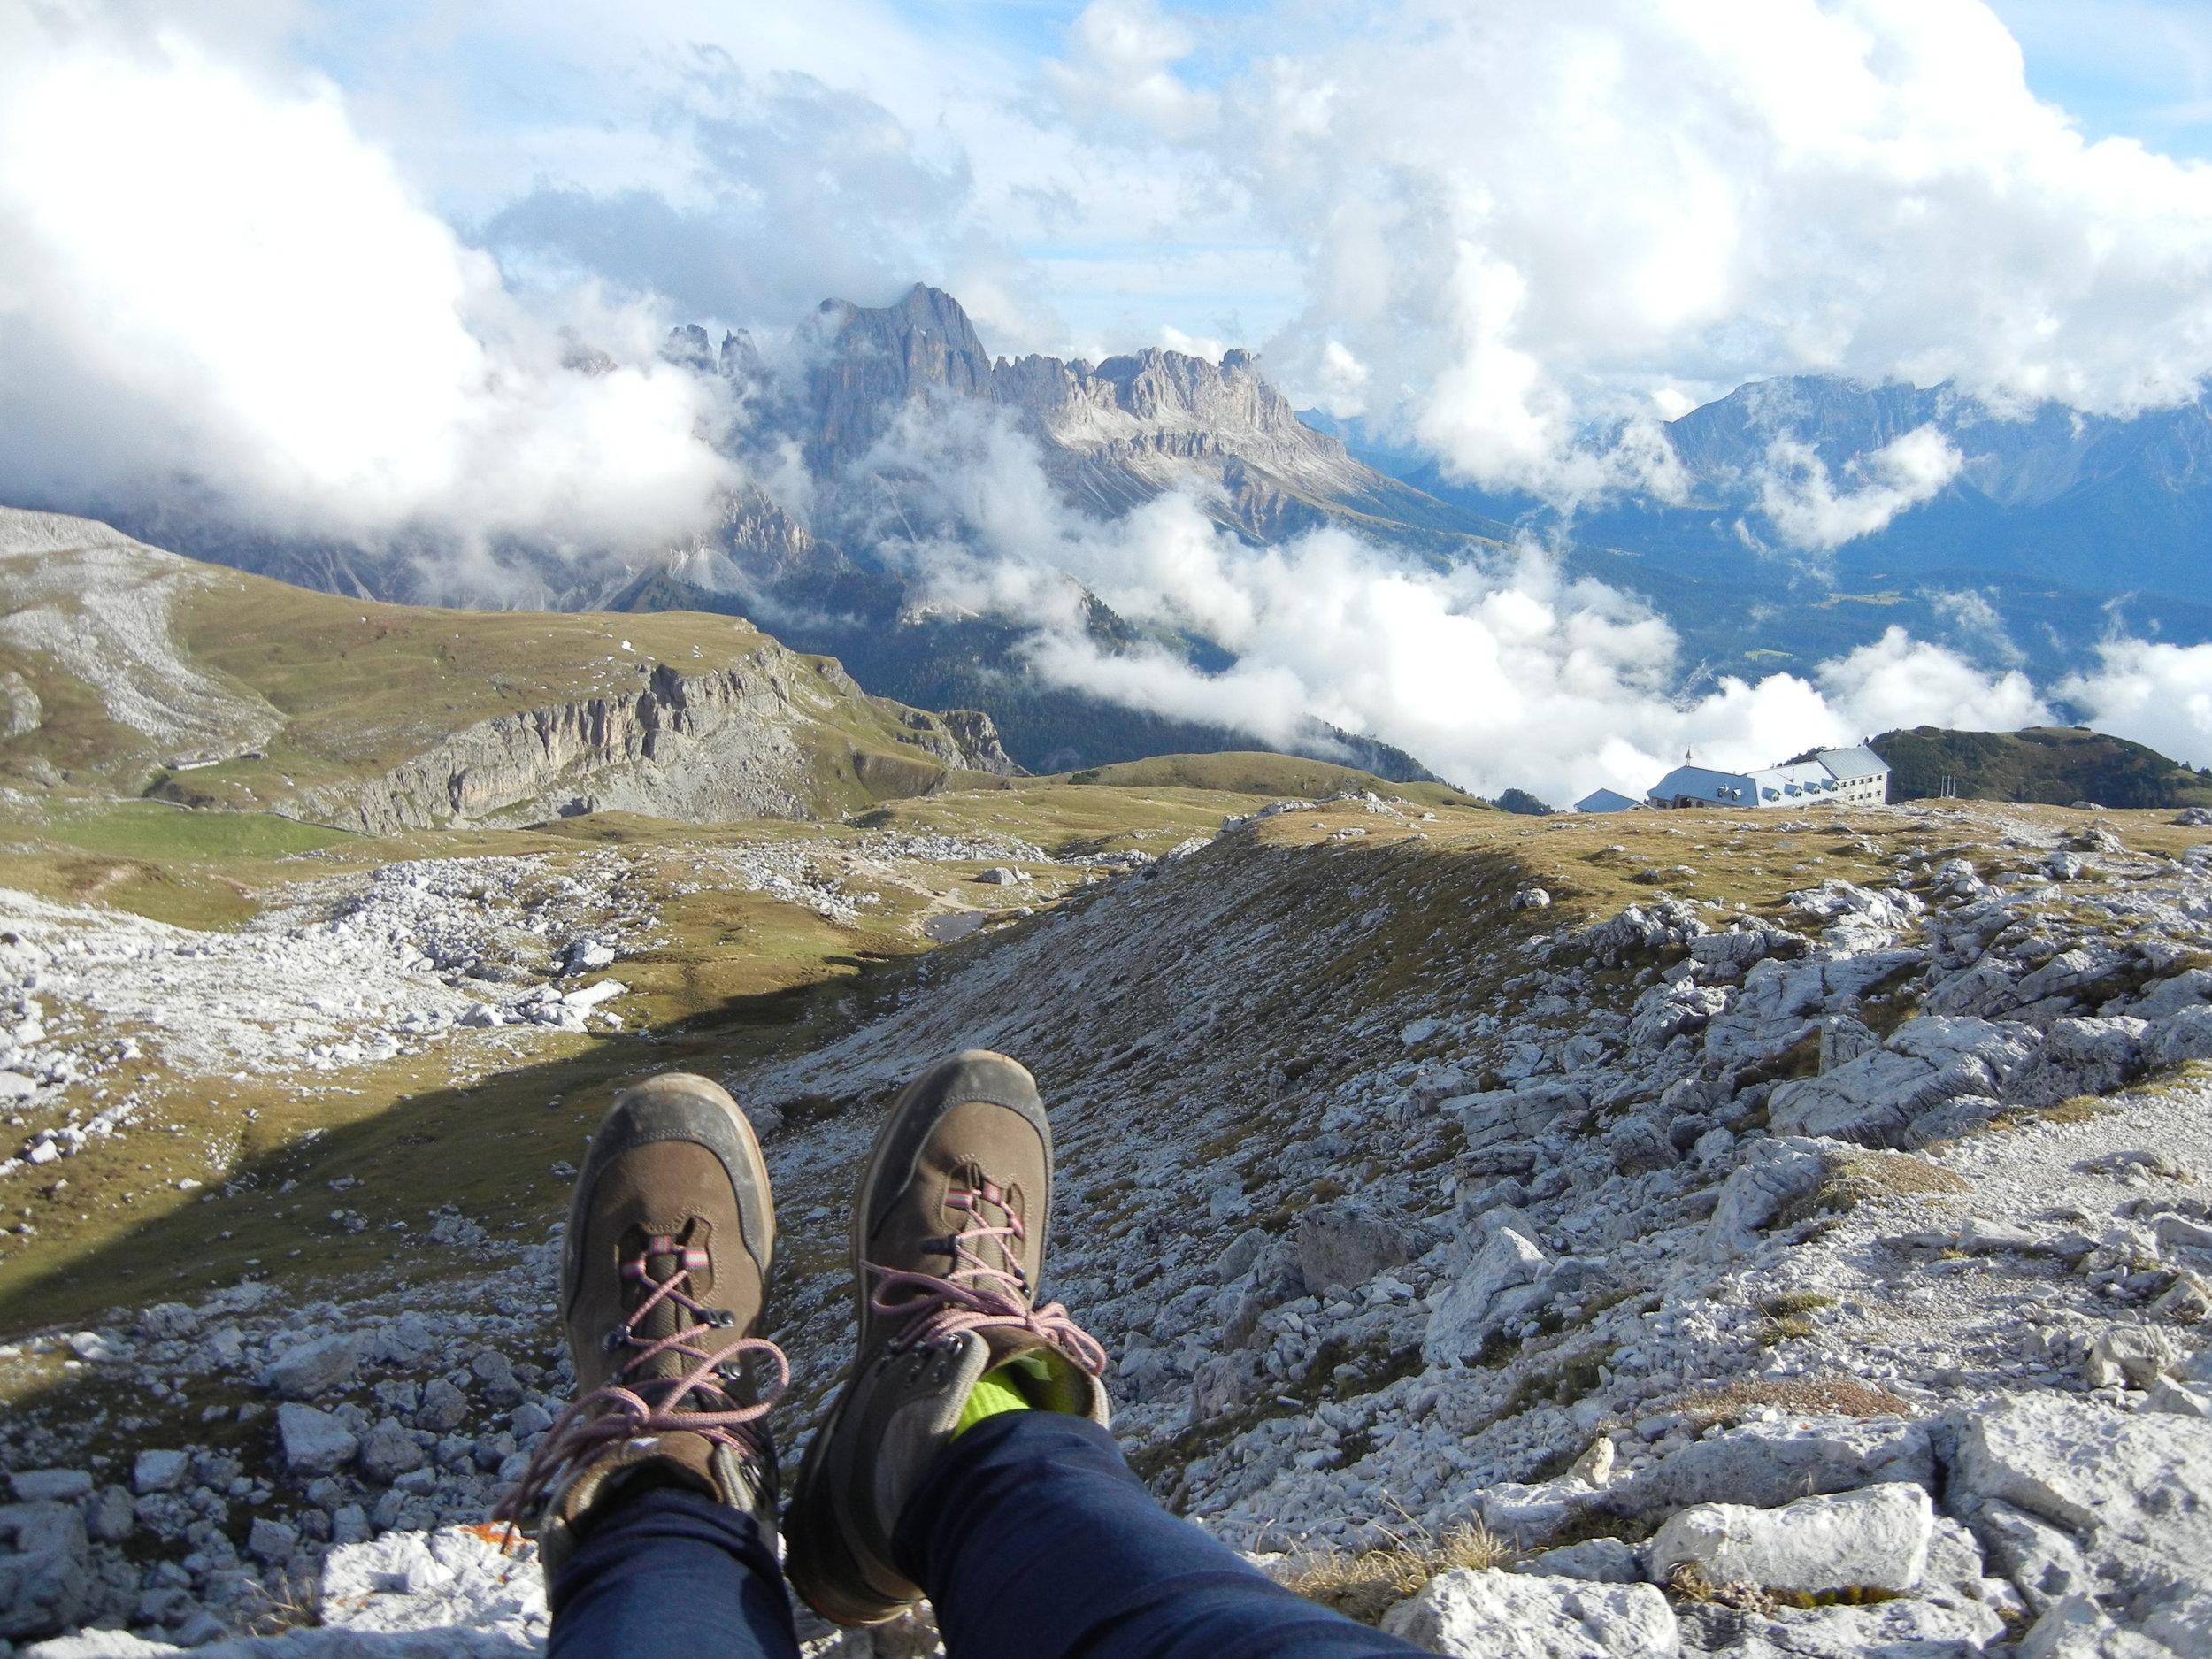 Wanderschuhe-Dolomiten-Berge.JPG